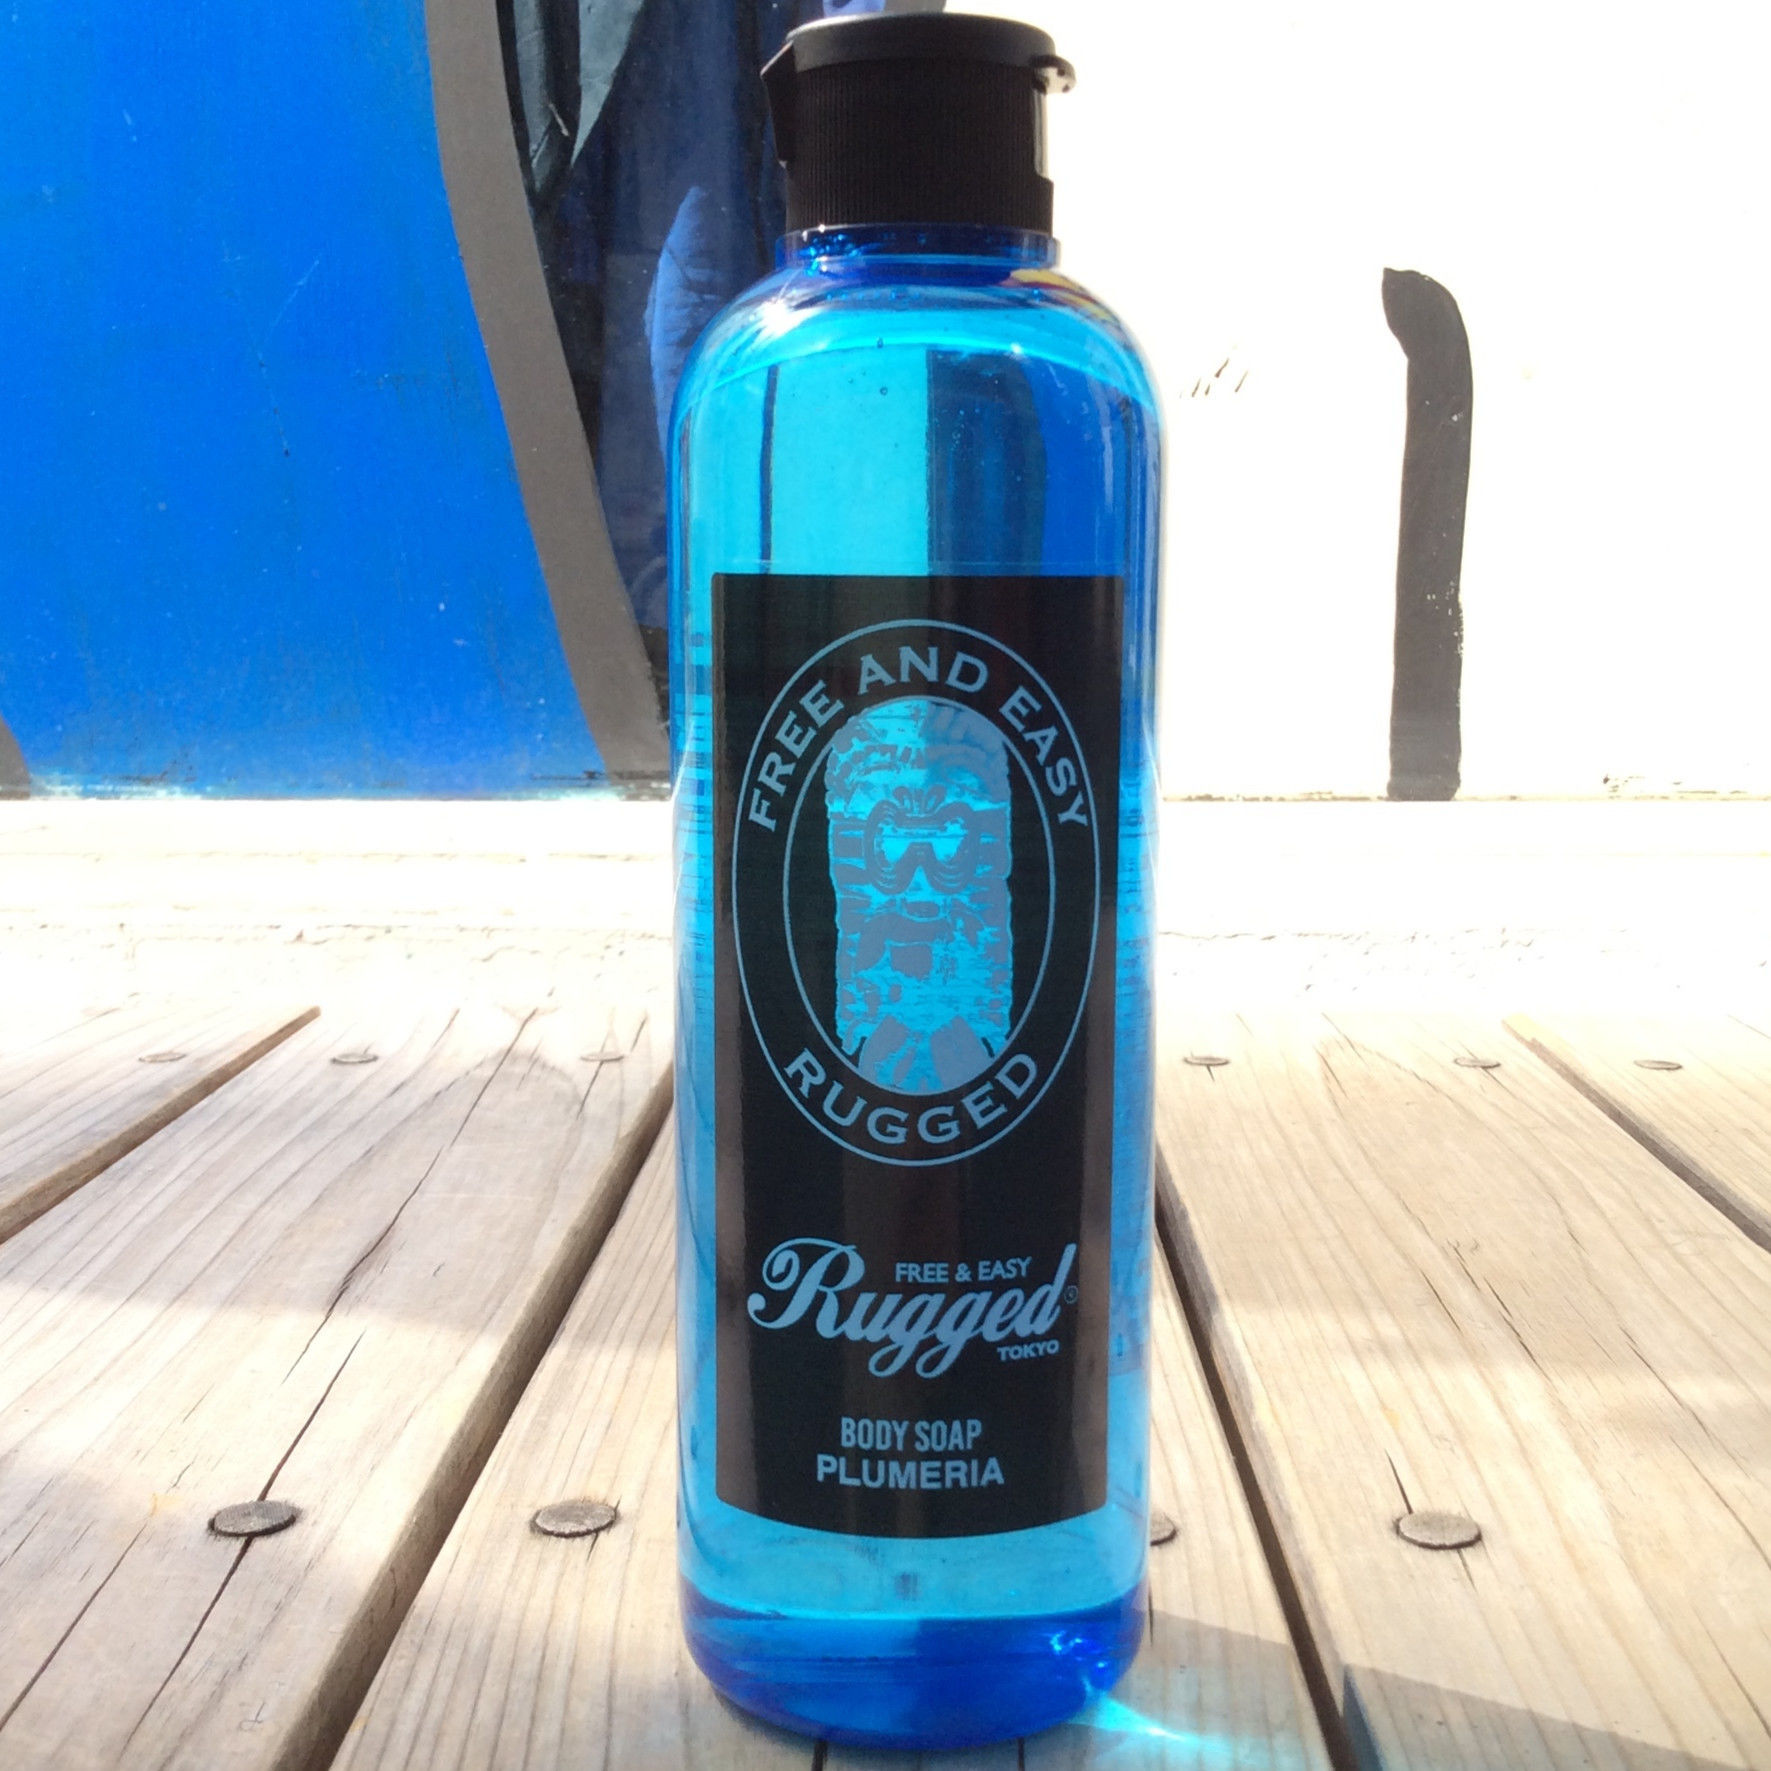 RUGGED BODY SOAP (plumeria)